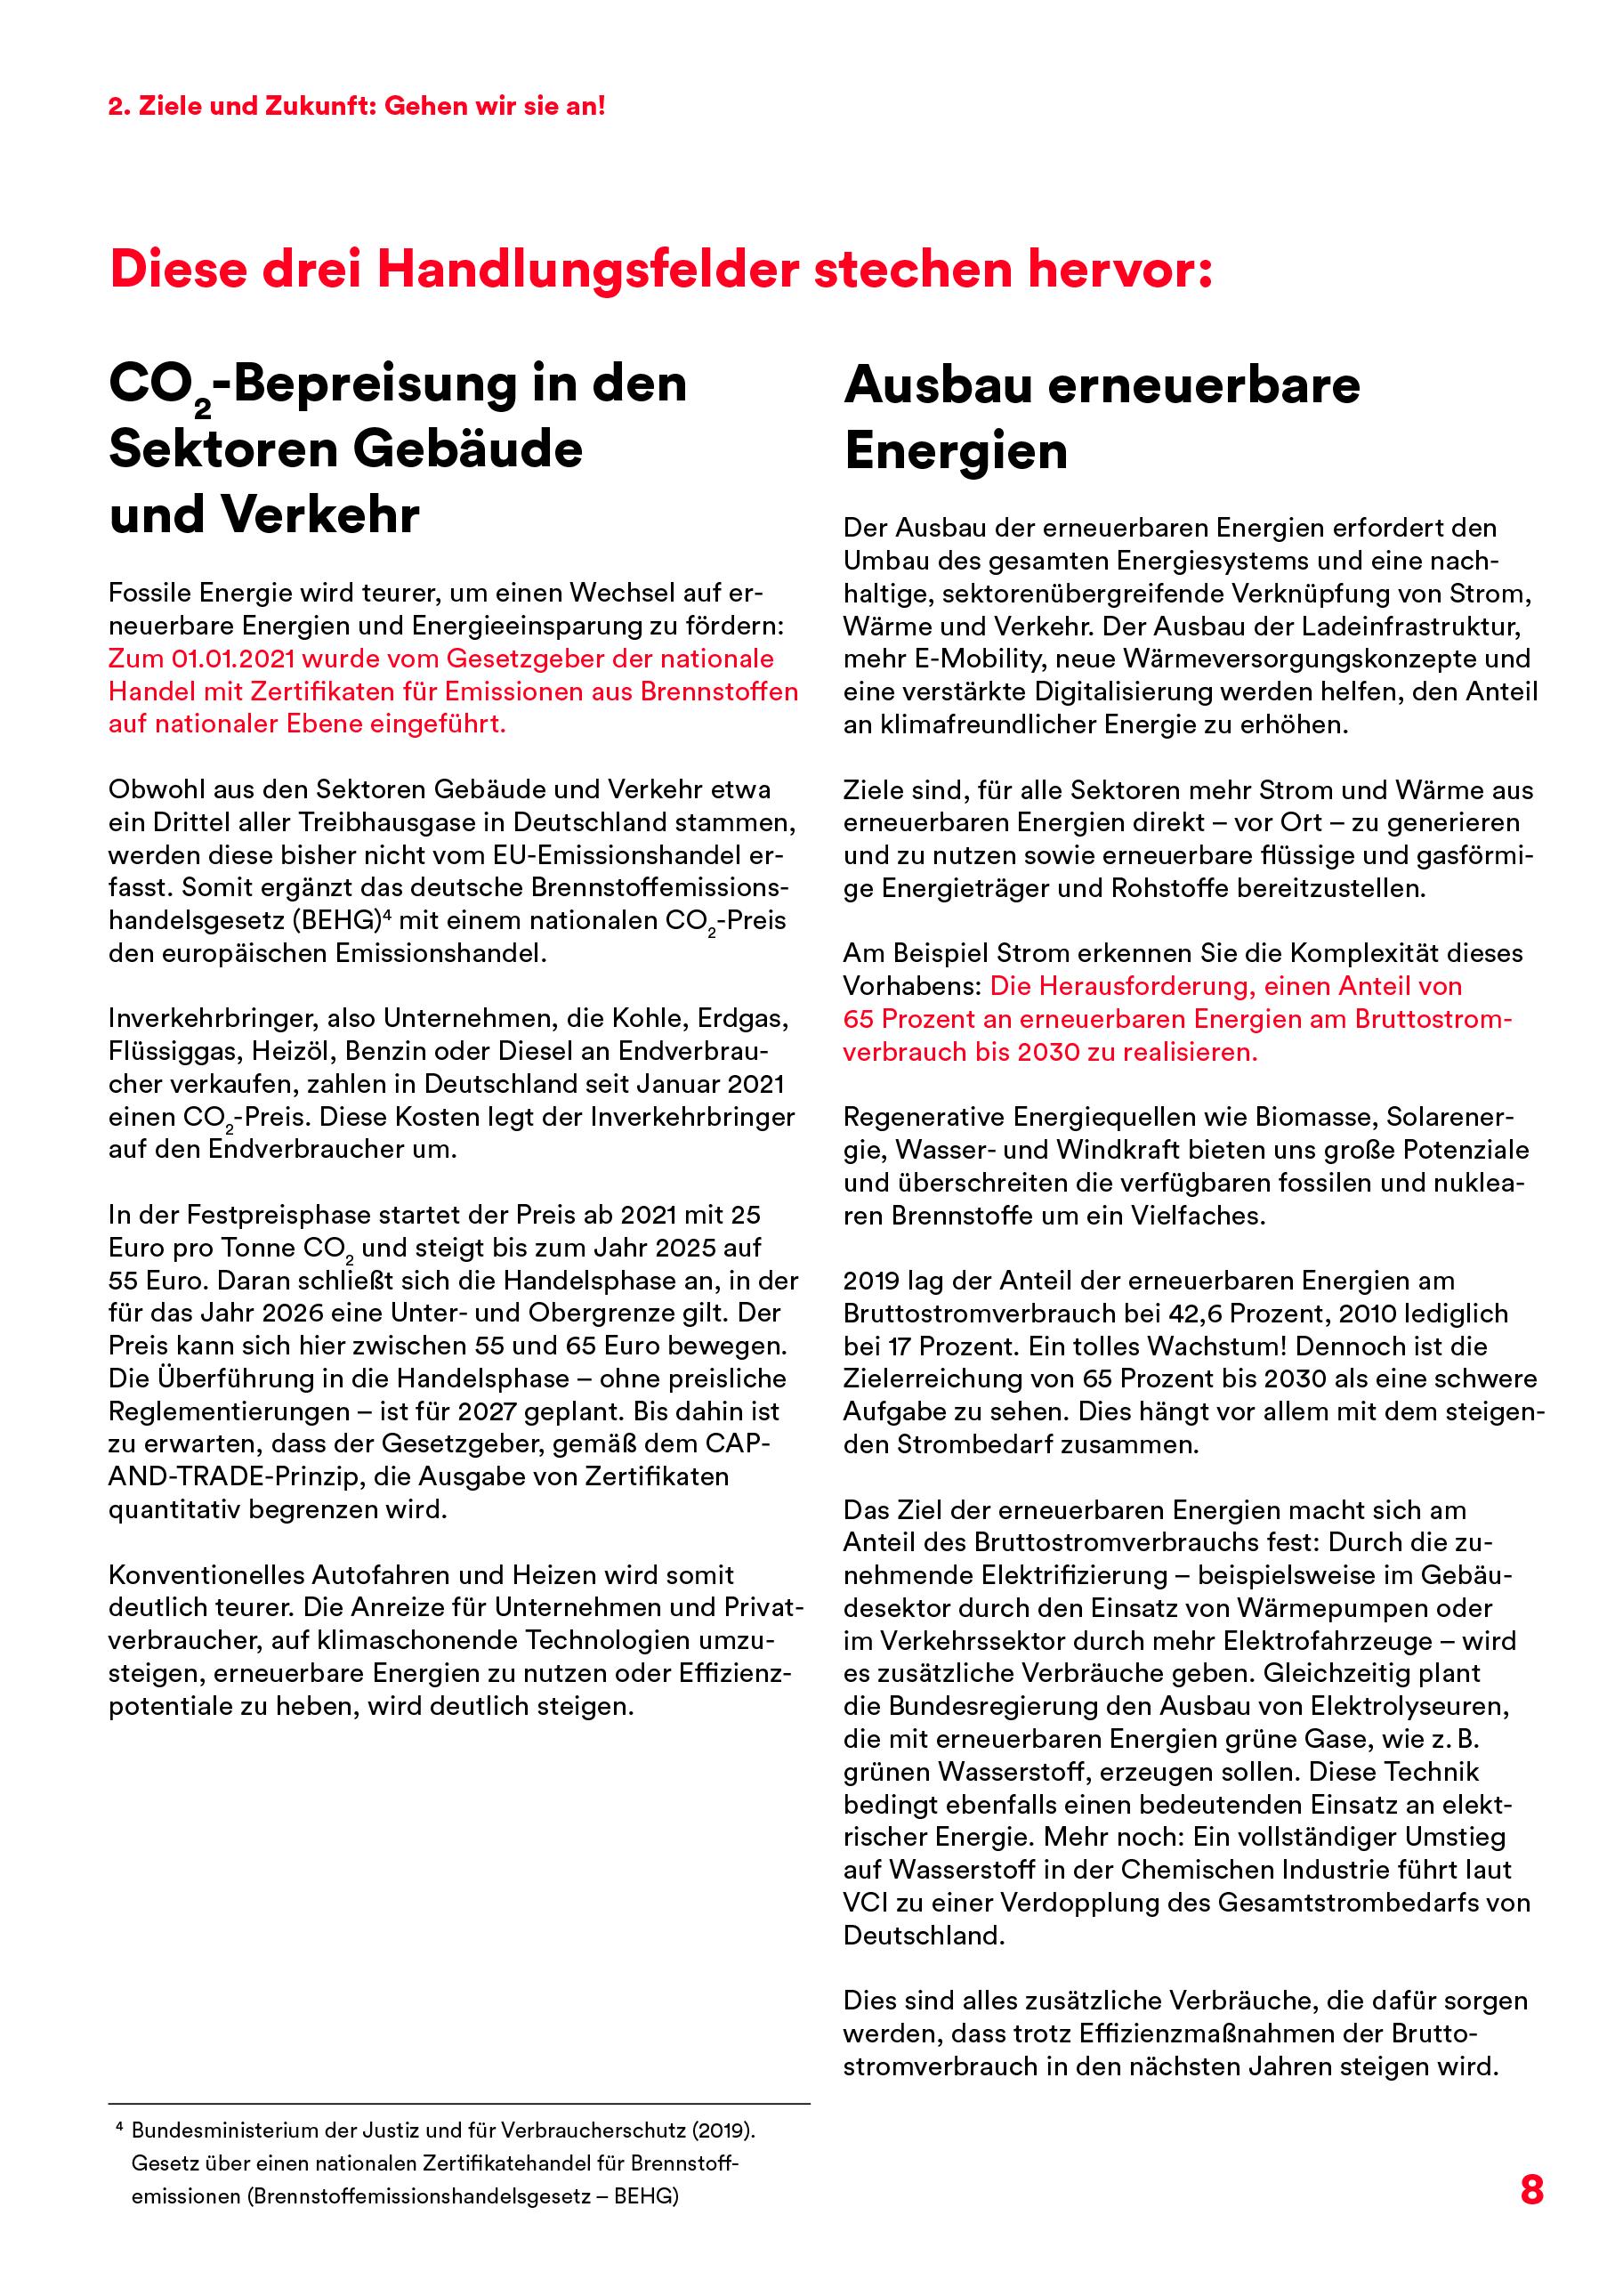 MVV-001_E-Book-Dekarbonisierung_S-7-1